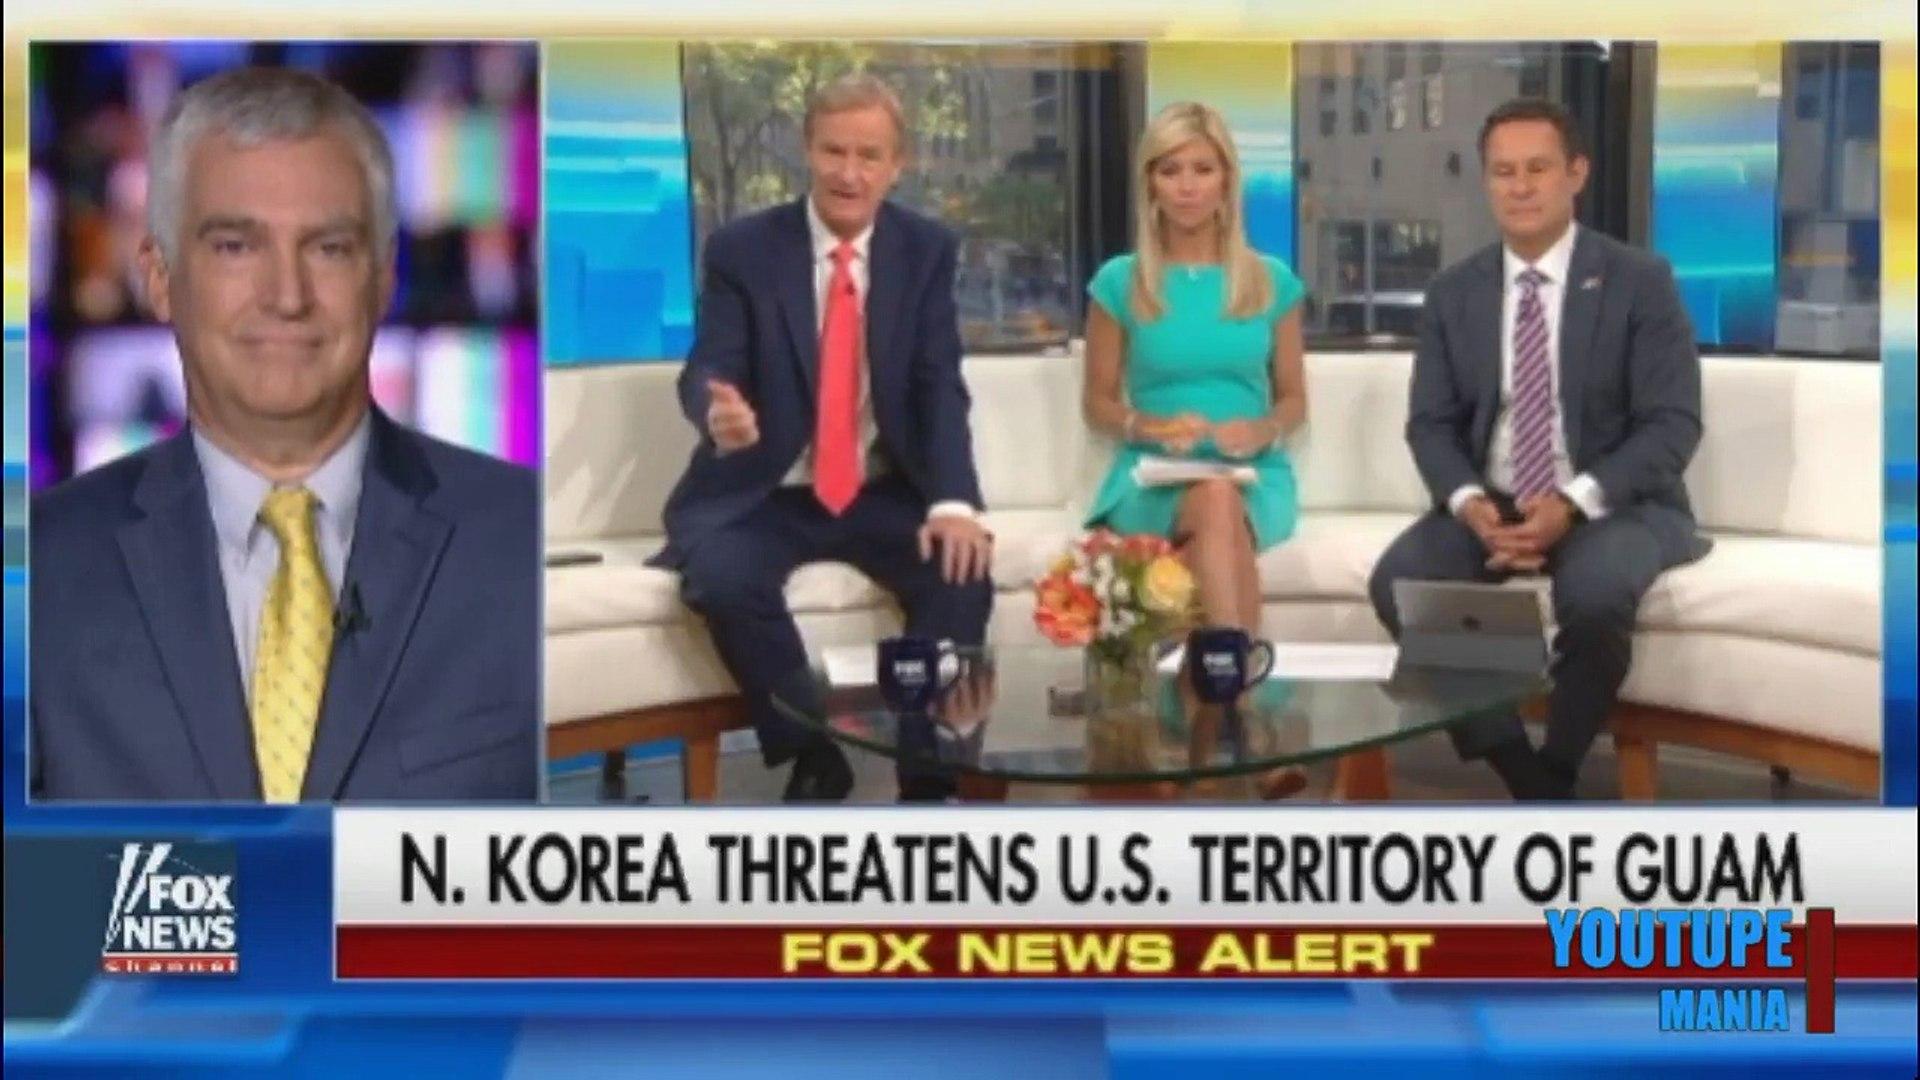 TRUMP WARNS NUCLEAR WEAPONS COULD BE USED IN PREEMPTIVE STRIKE ON N.KOREA